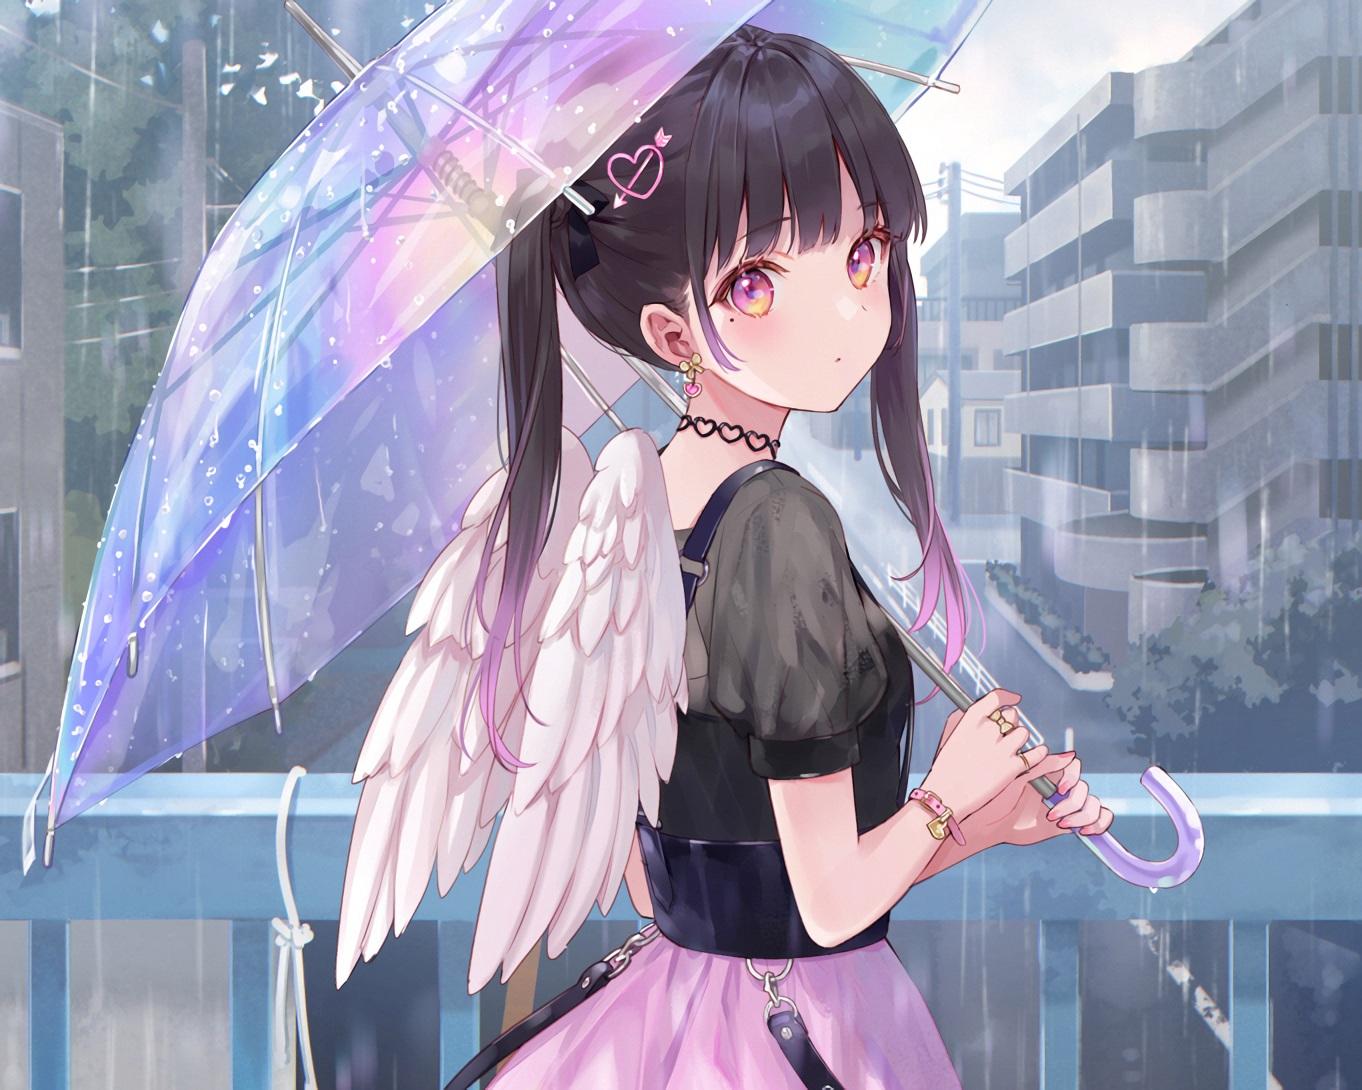 black_hair building choker city cropped fukahire_sanba original pink_eyes rain see_through skirt twintails umbrella waifu2x water wings wristwear